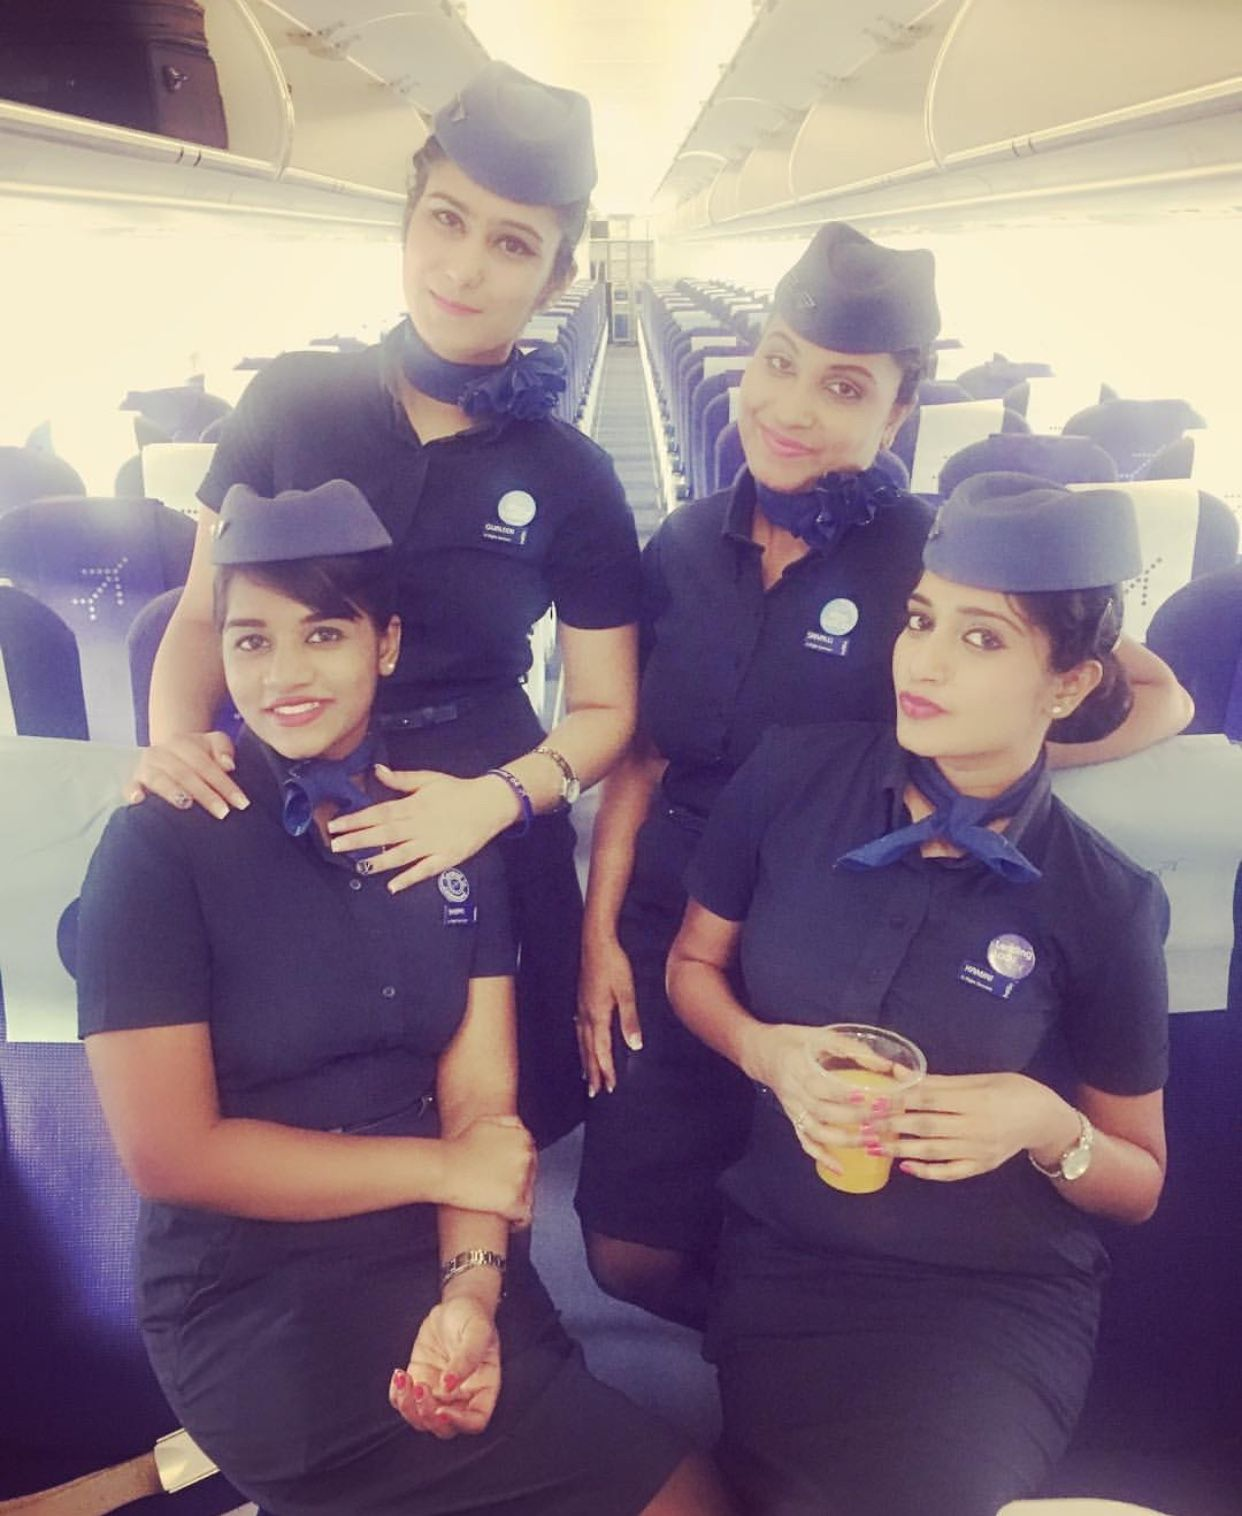 Indigo Cabin Crew Uniform